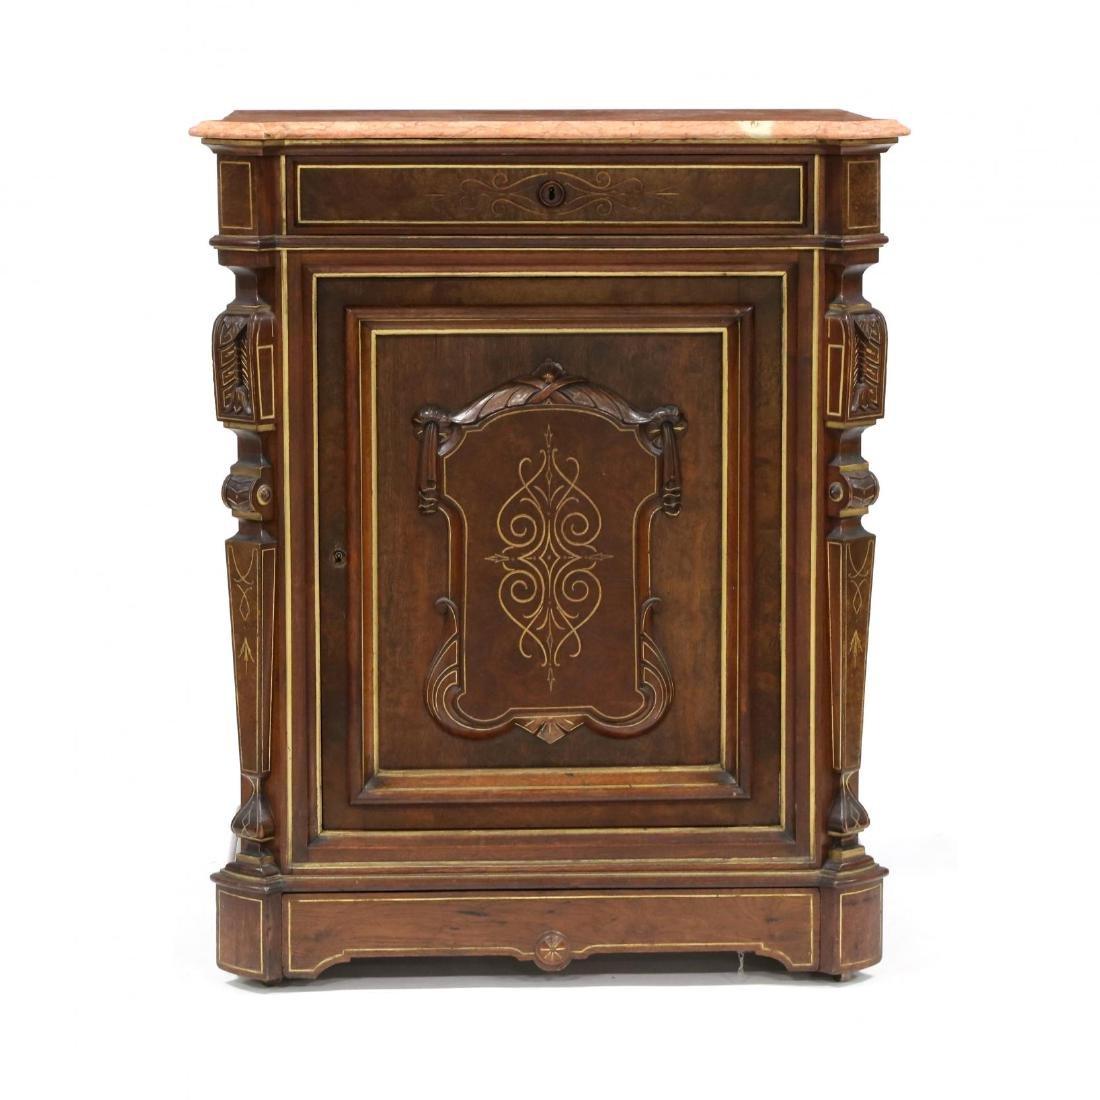 American Renaissance Revival Marble Top Cabinet